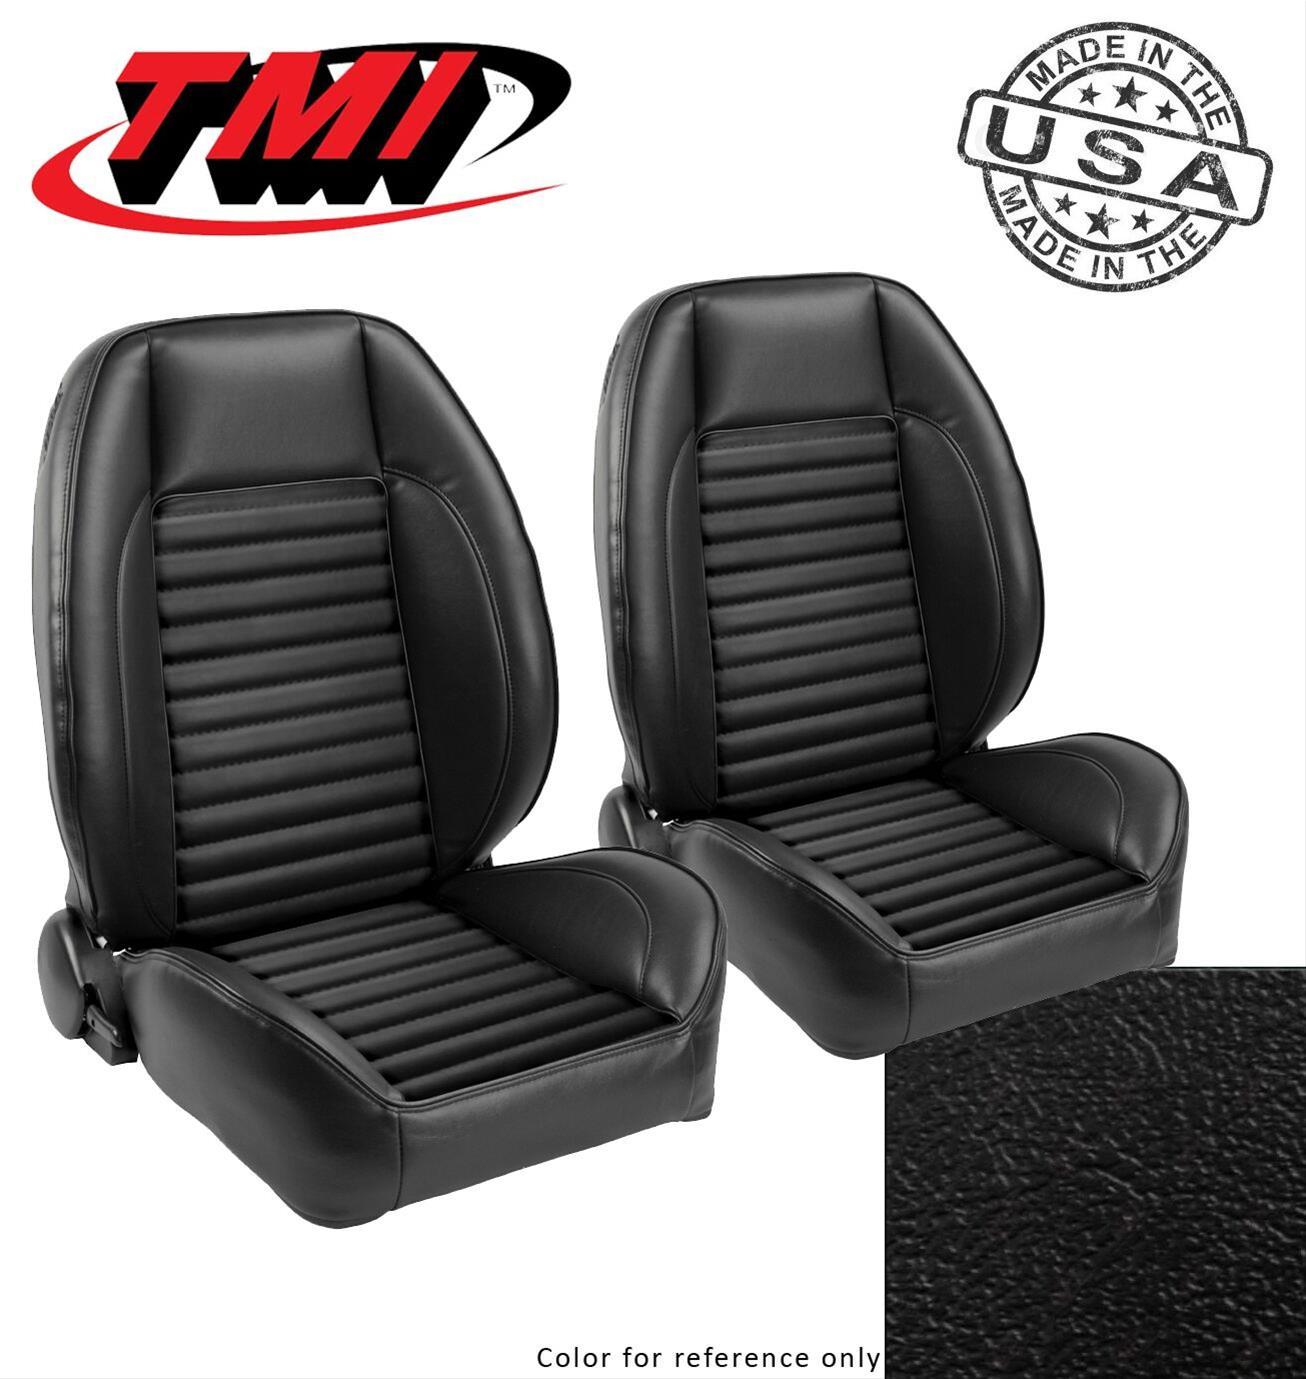 Prime Tmi Pro Series Low Back Seats 47 7000 958 Uwap Interior Chair Design Uwaporg